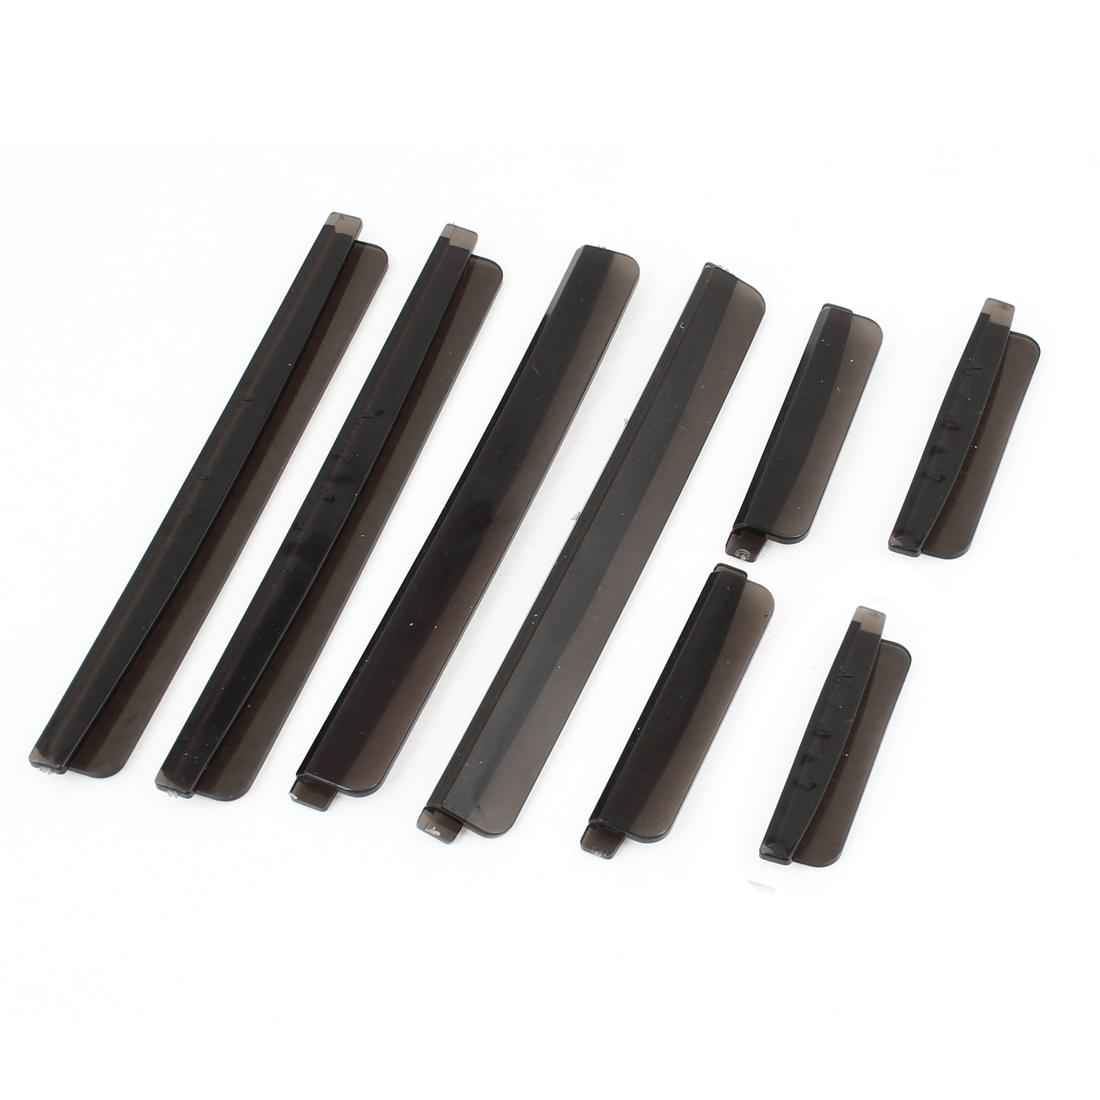 8 Pcs Black Soft Plastic Door Guard Sticker w Dual Adhesive Tape for Car